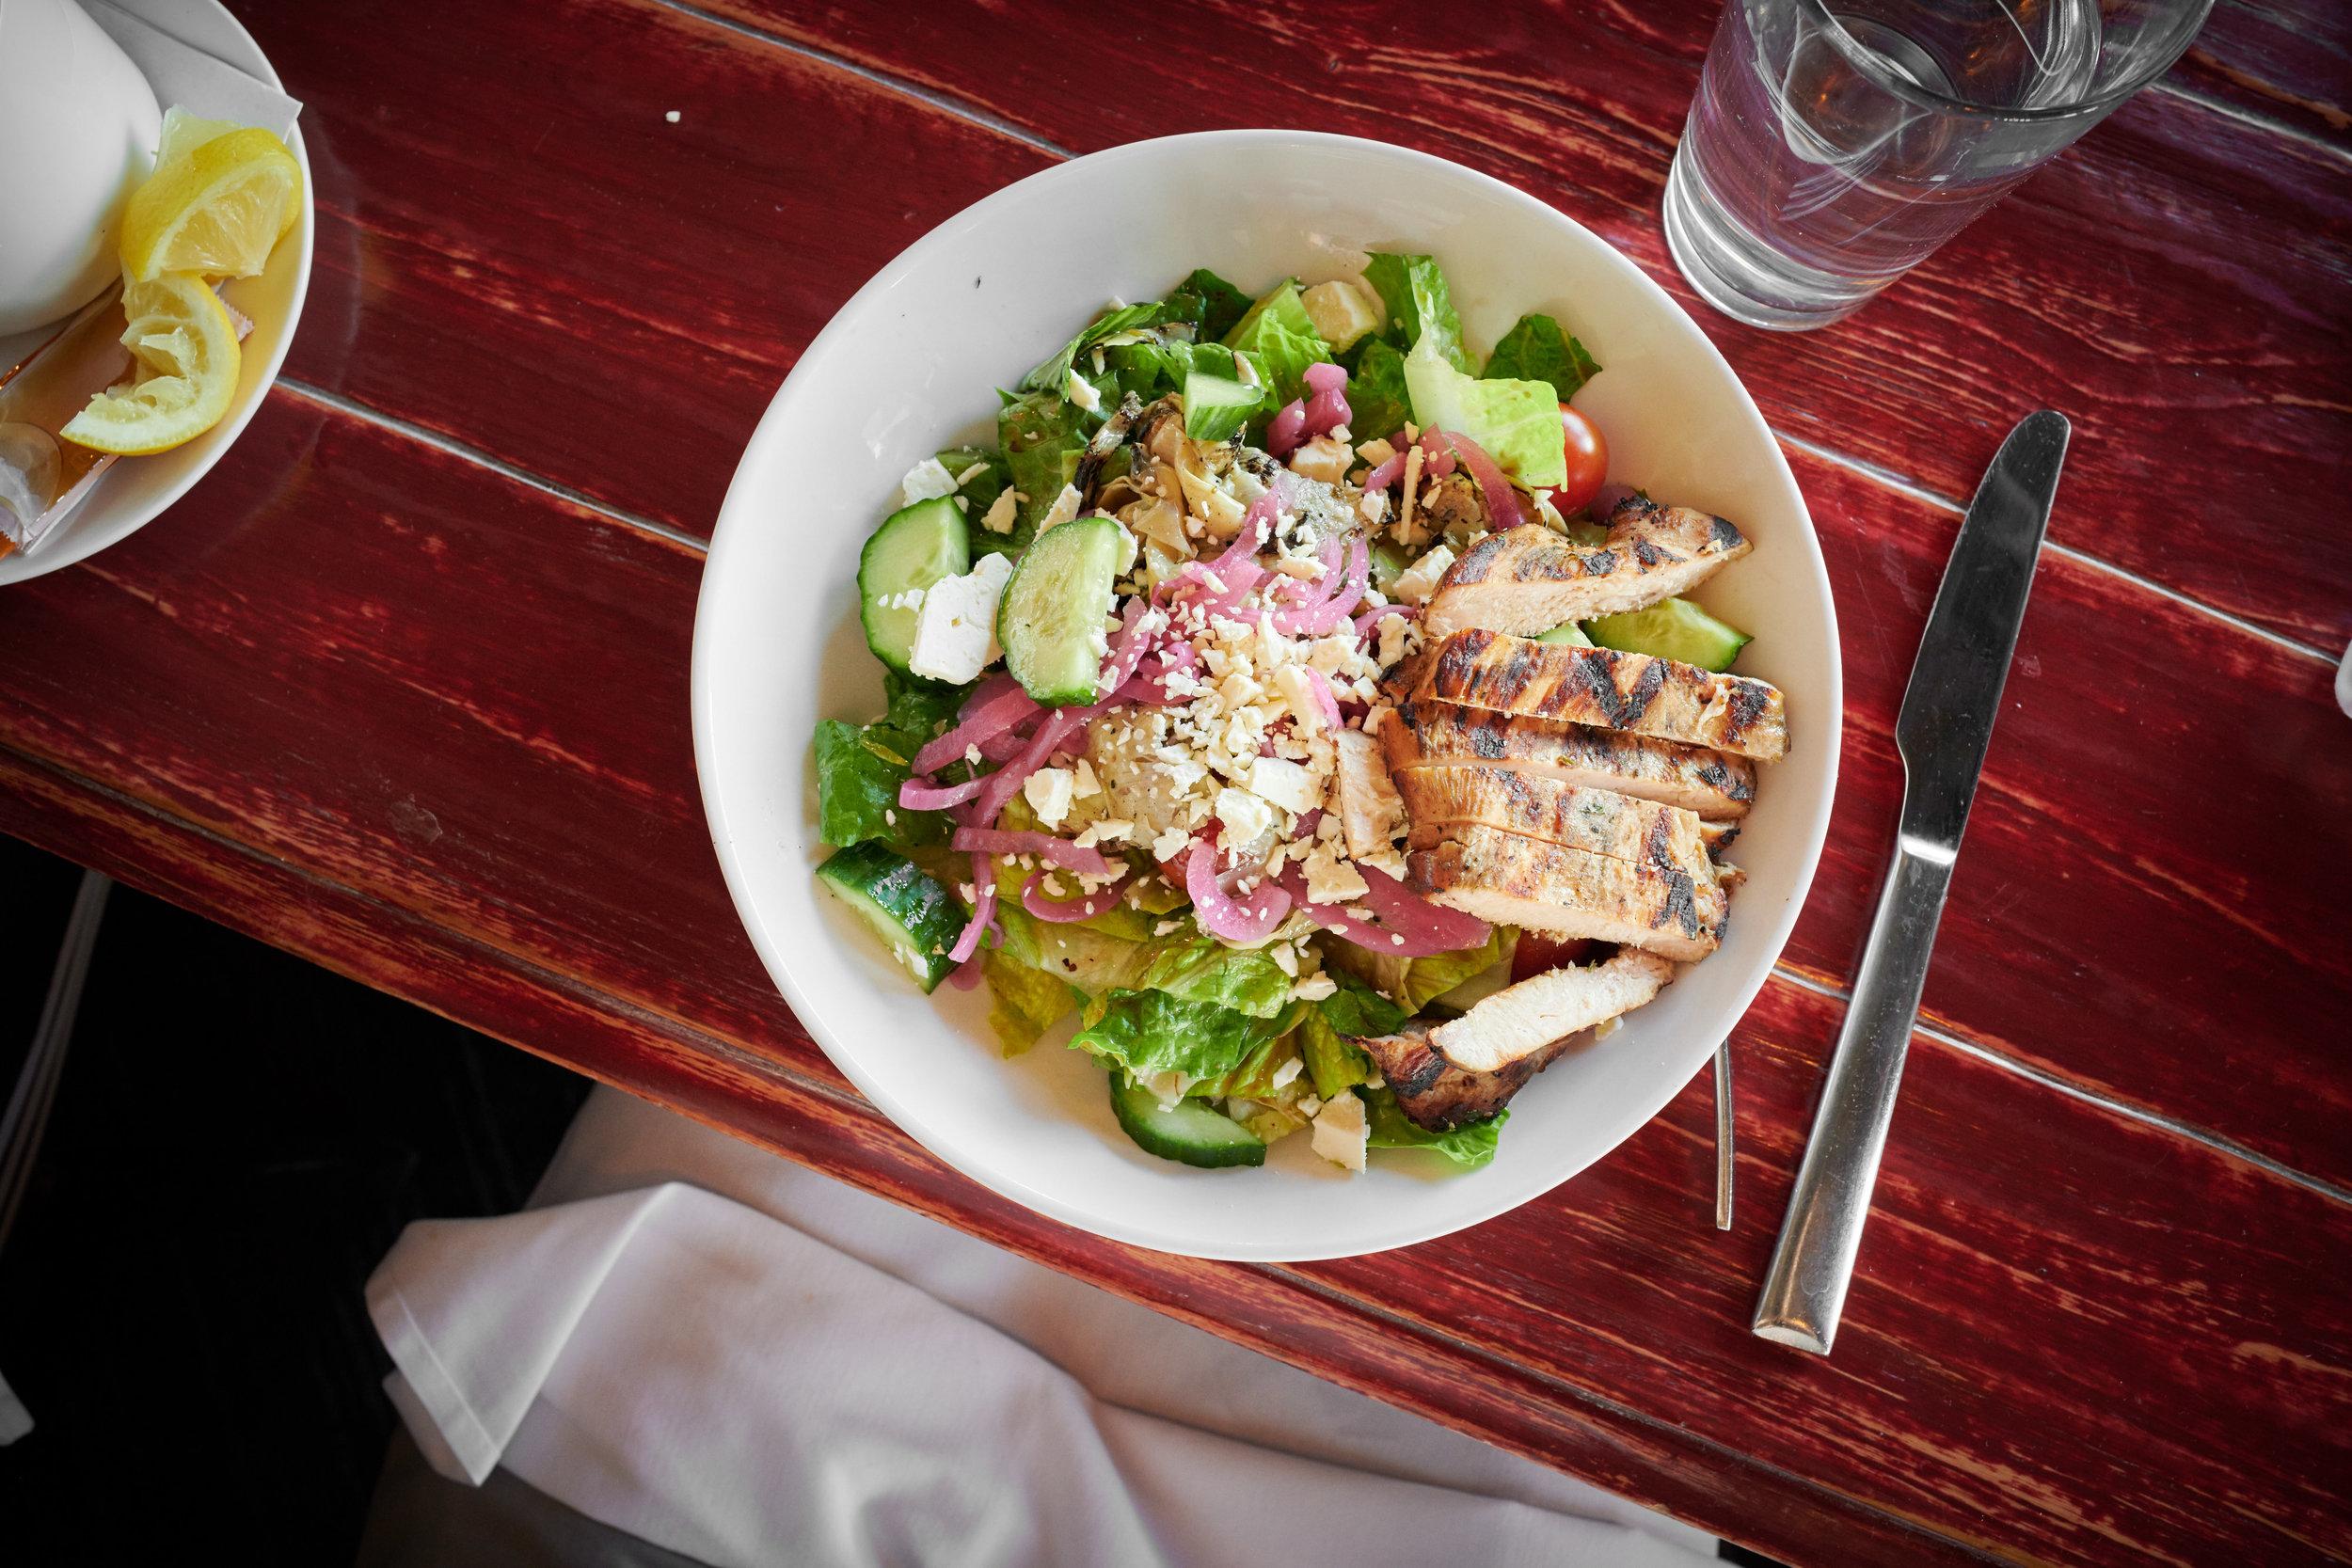 Greek Chop Salad, Chopped Romaine, Grilled Artichoke, Tomato, Pickled Onions, Cucumber, Feta Cheese, Balsamic Vinaigrette